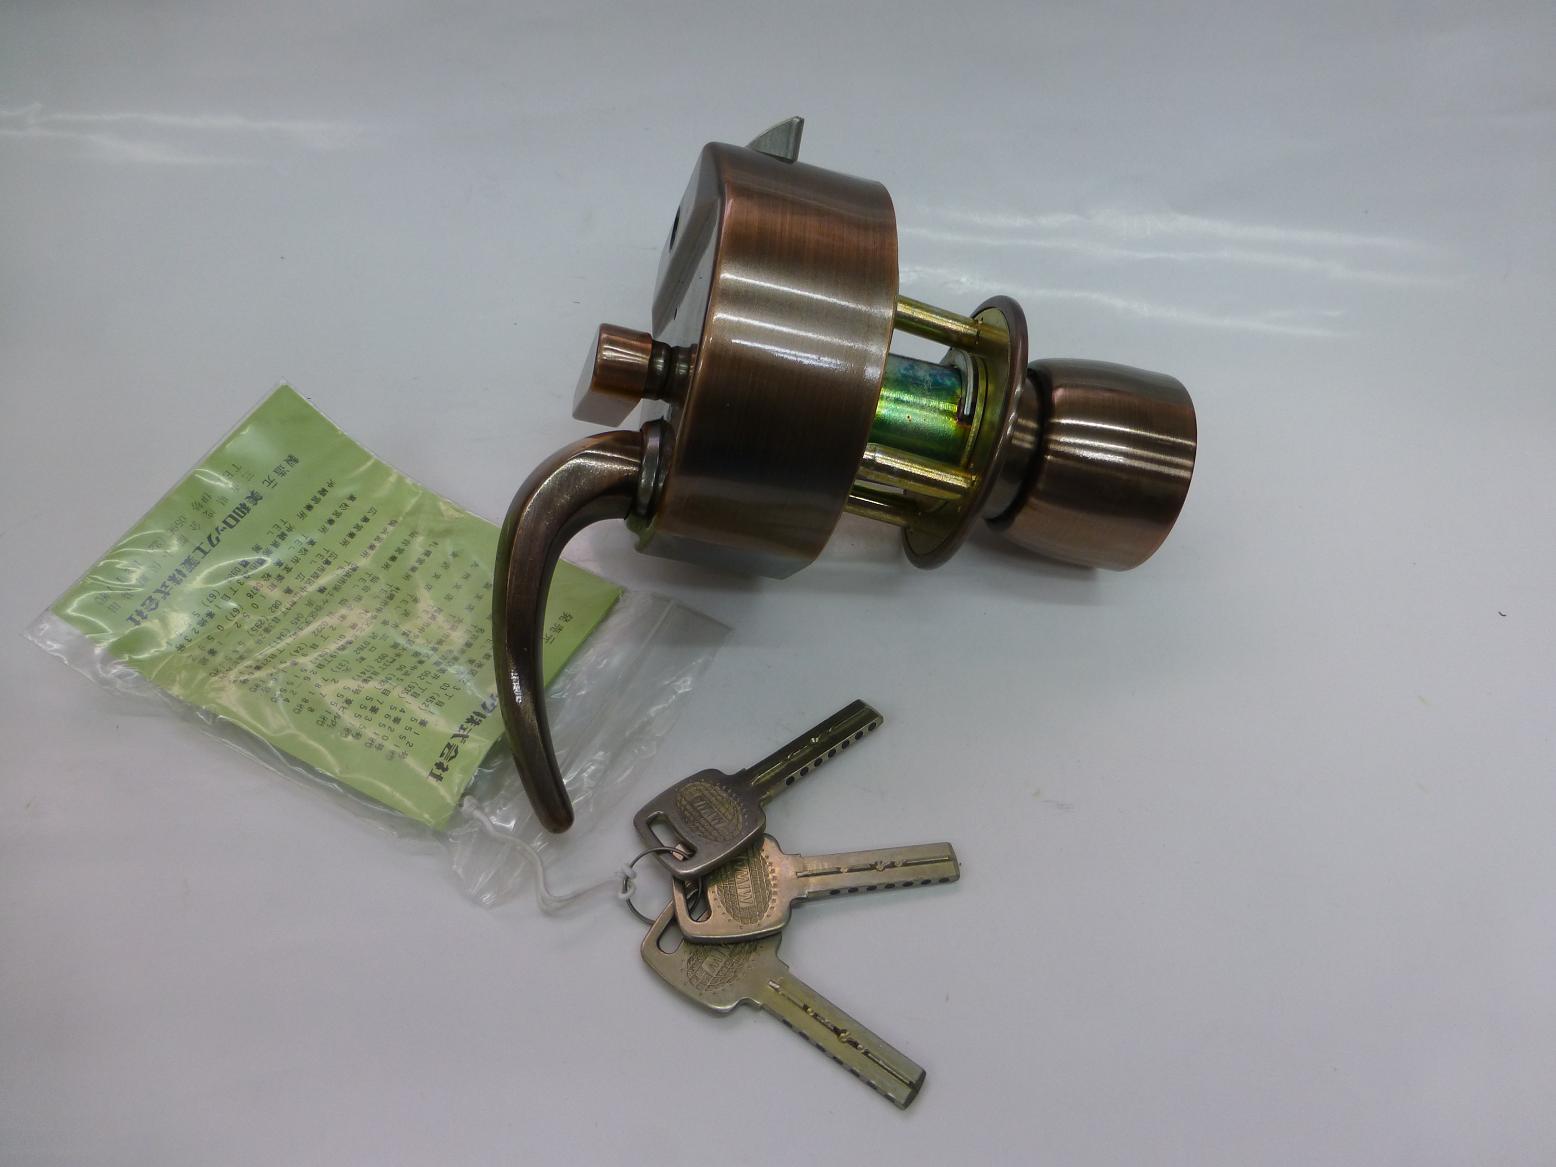 MIWA 本締錠 EC HPD-40KJ RK(ブロンズ)